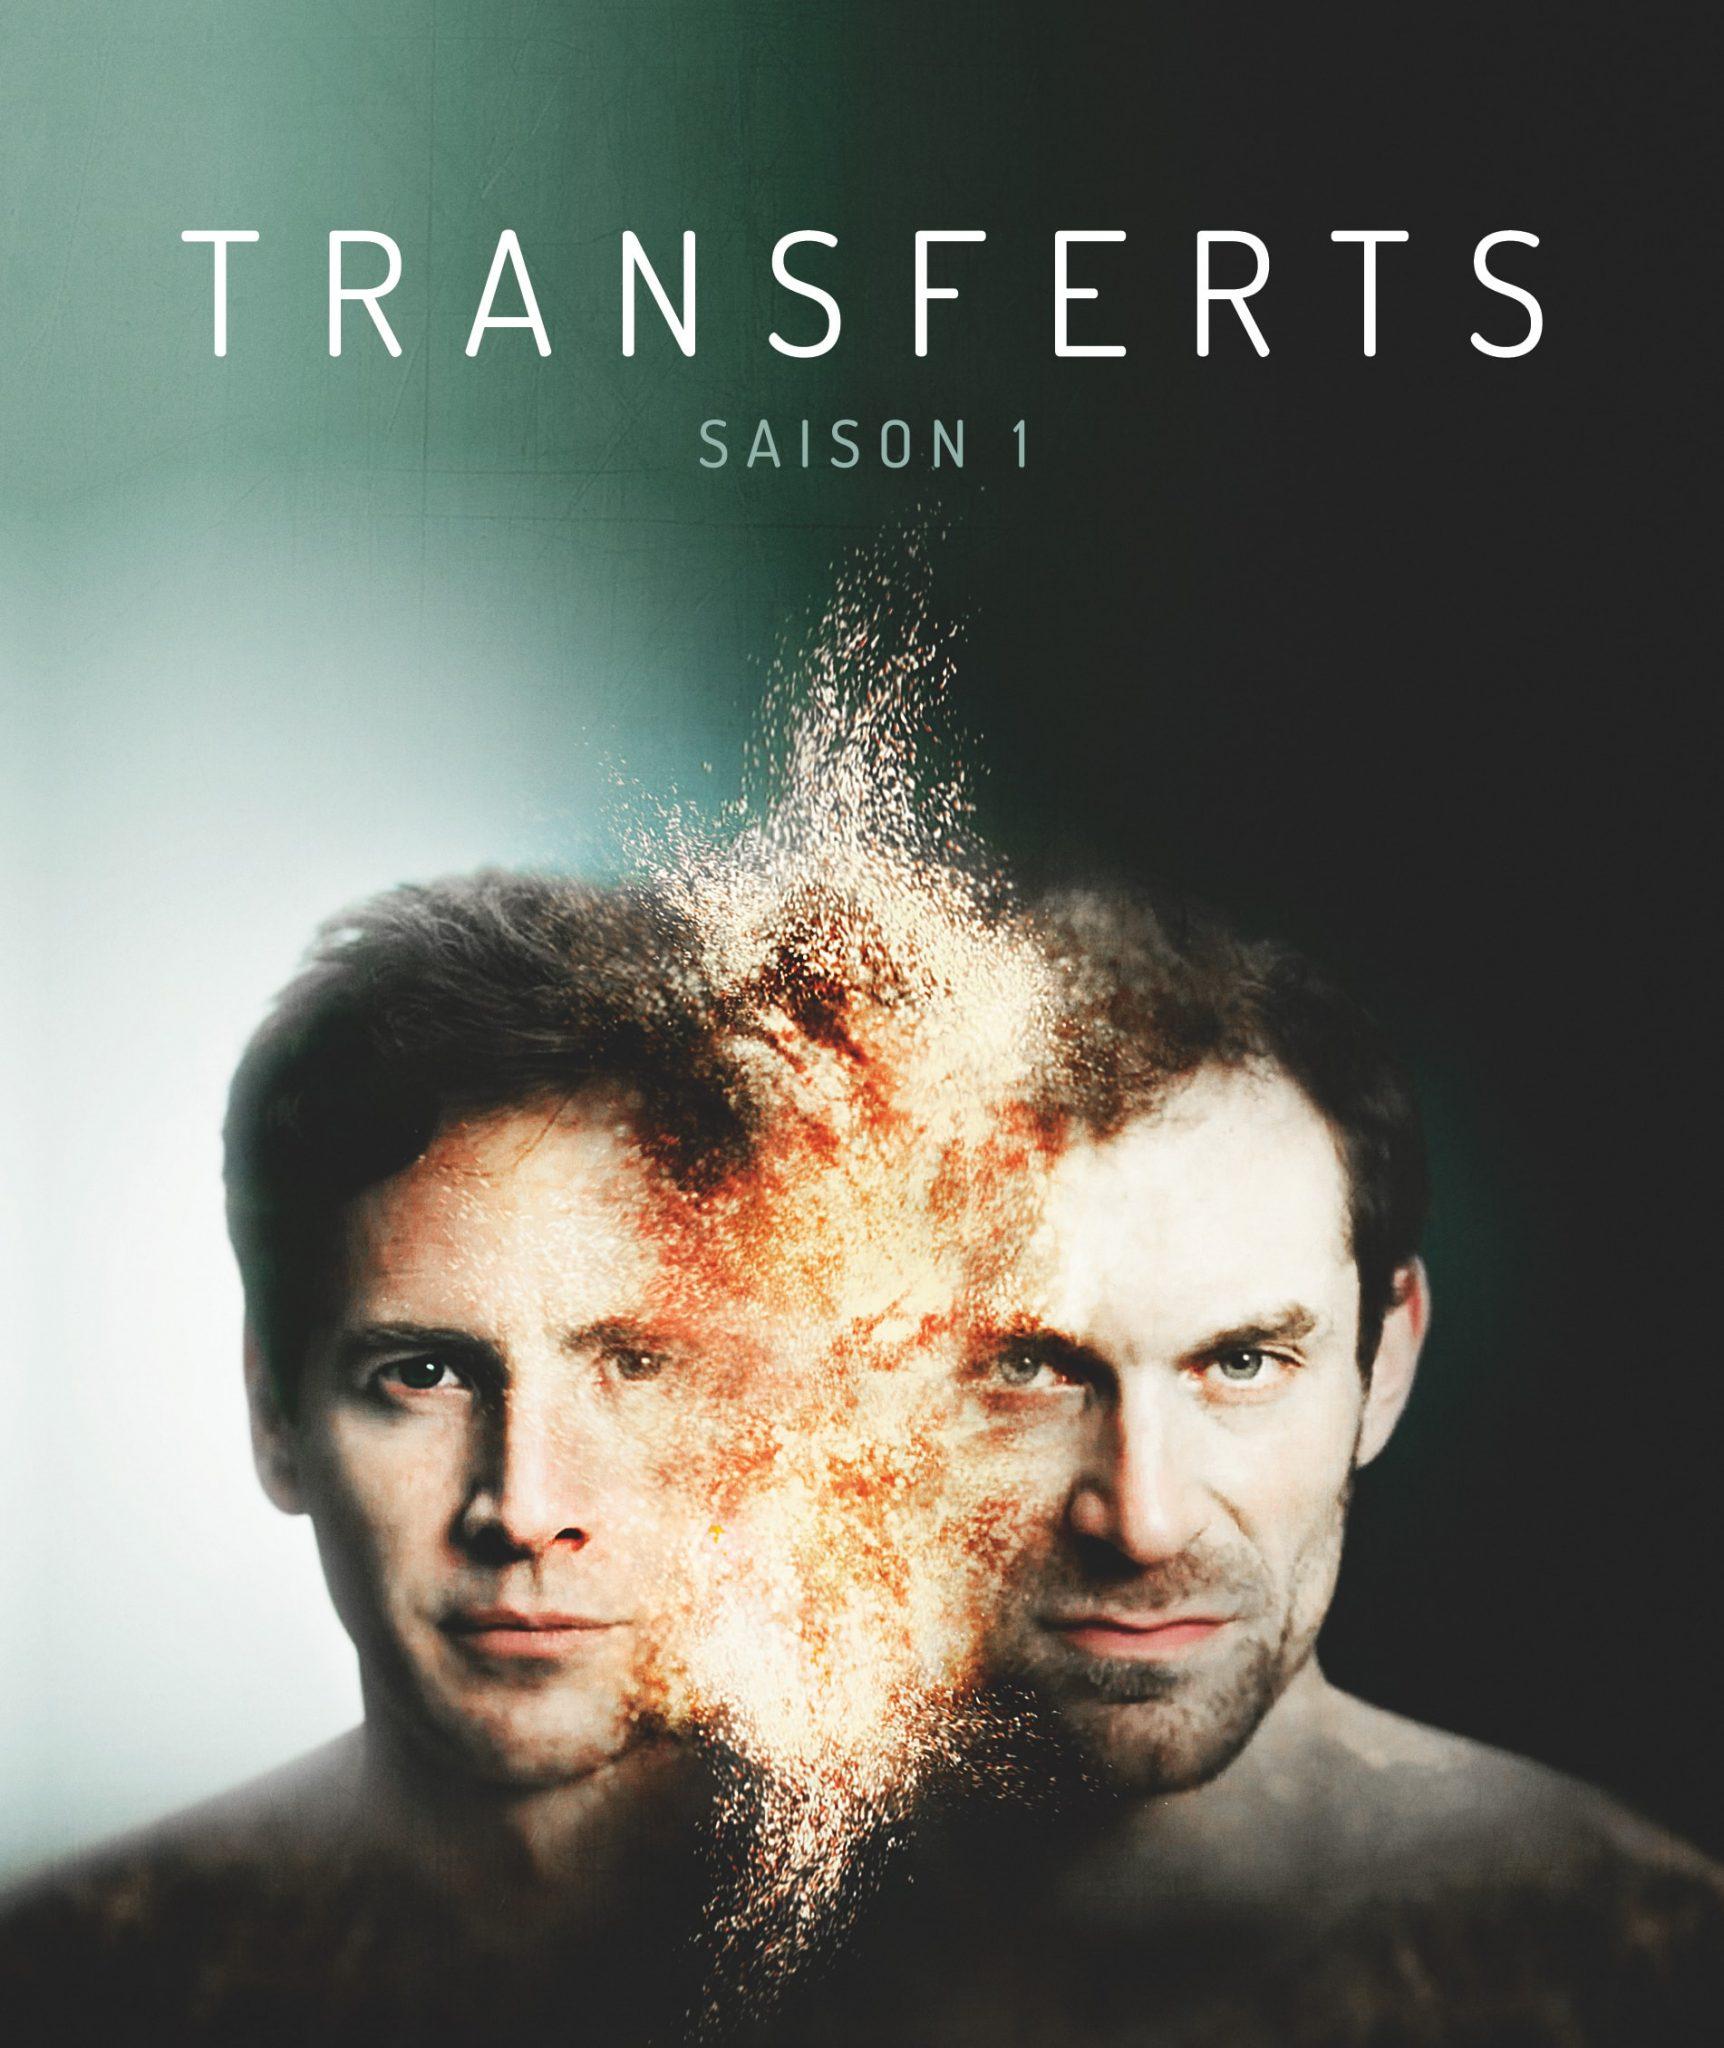 Transferts saison 1 affiche